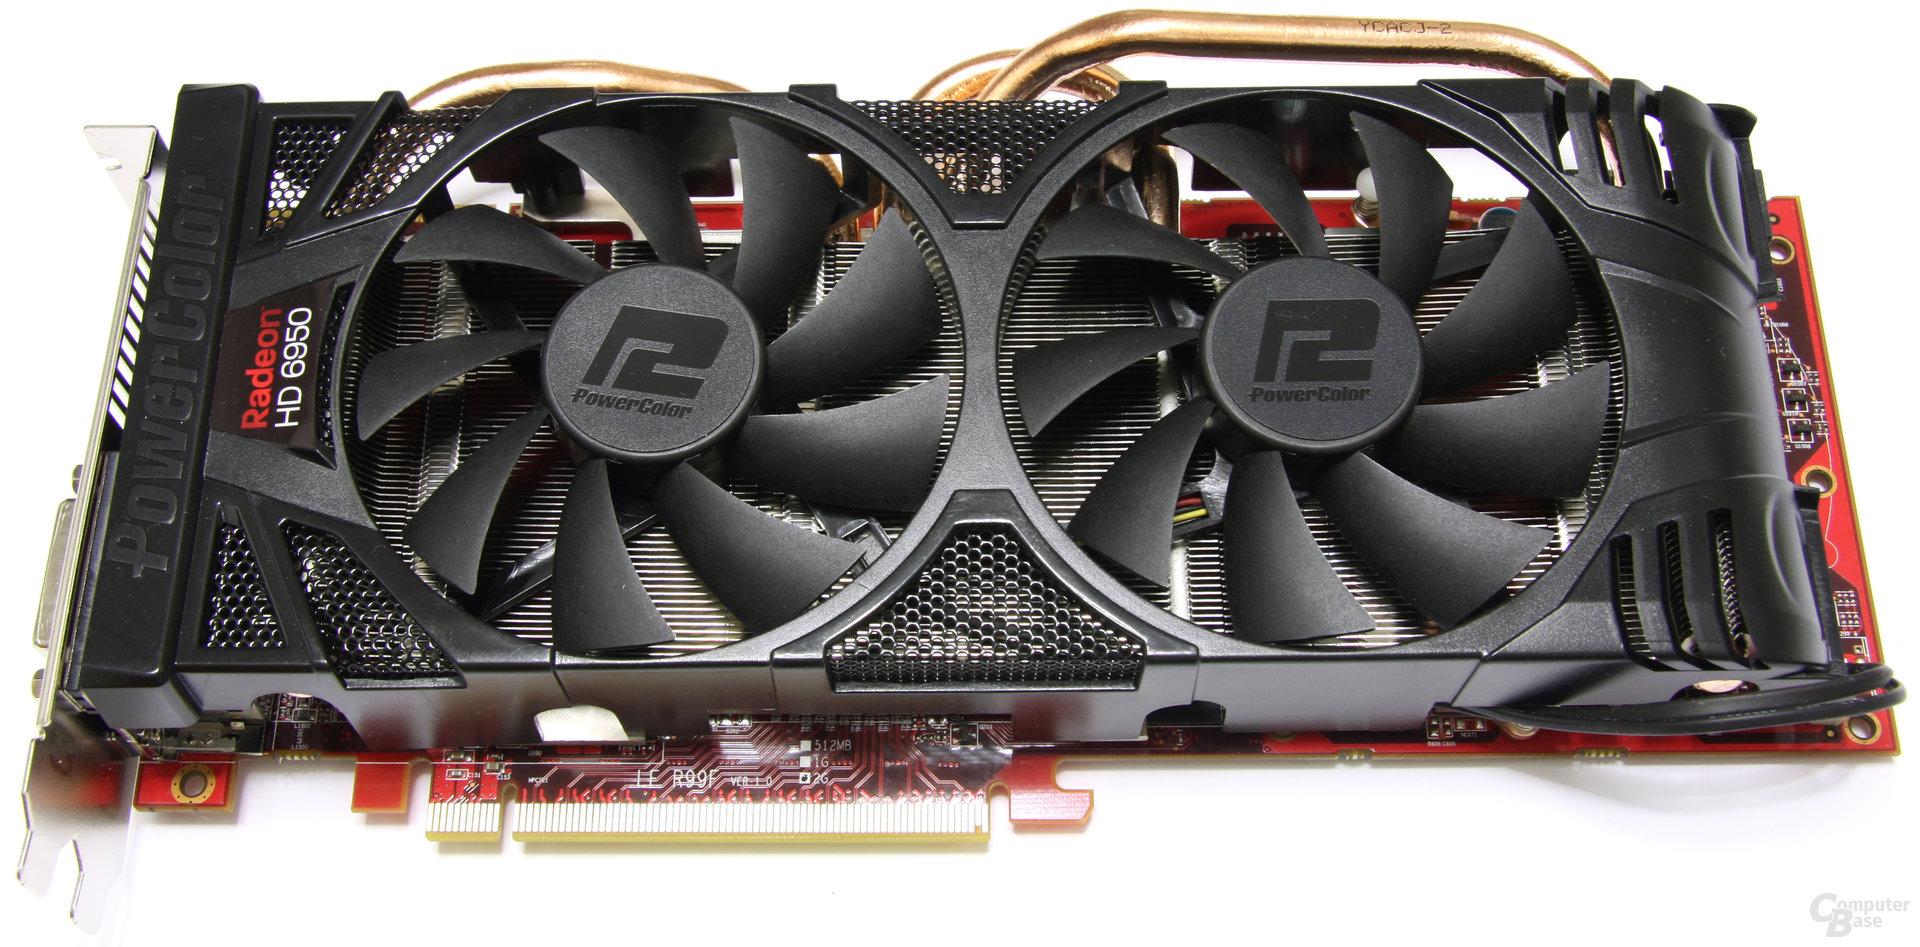 PowerColor Radeon HD 6950 PCS++